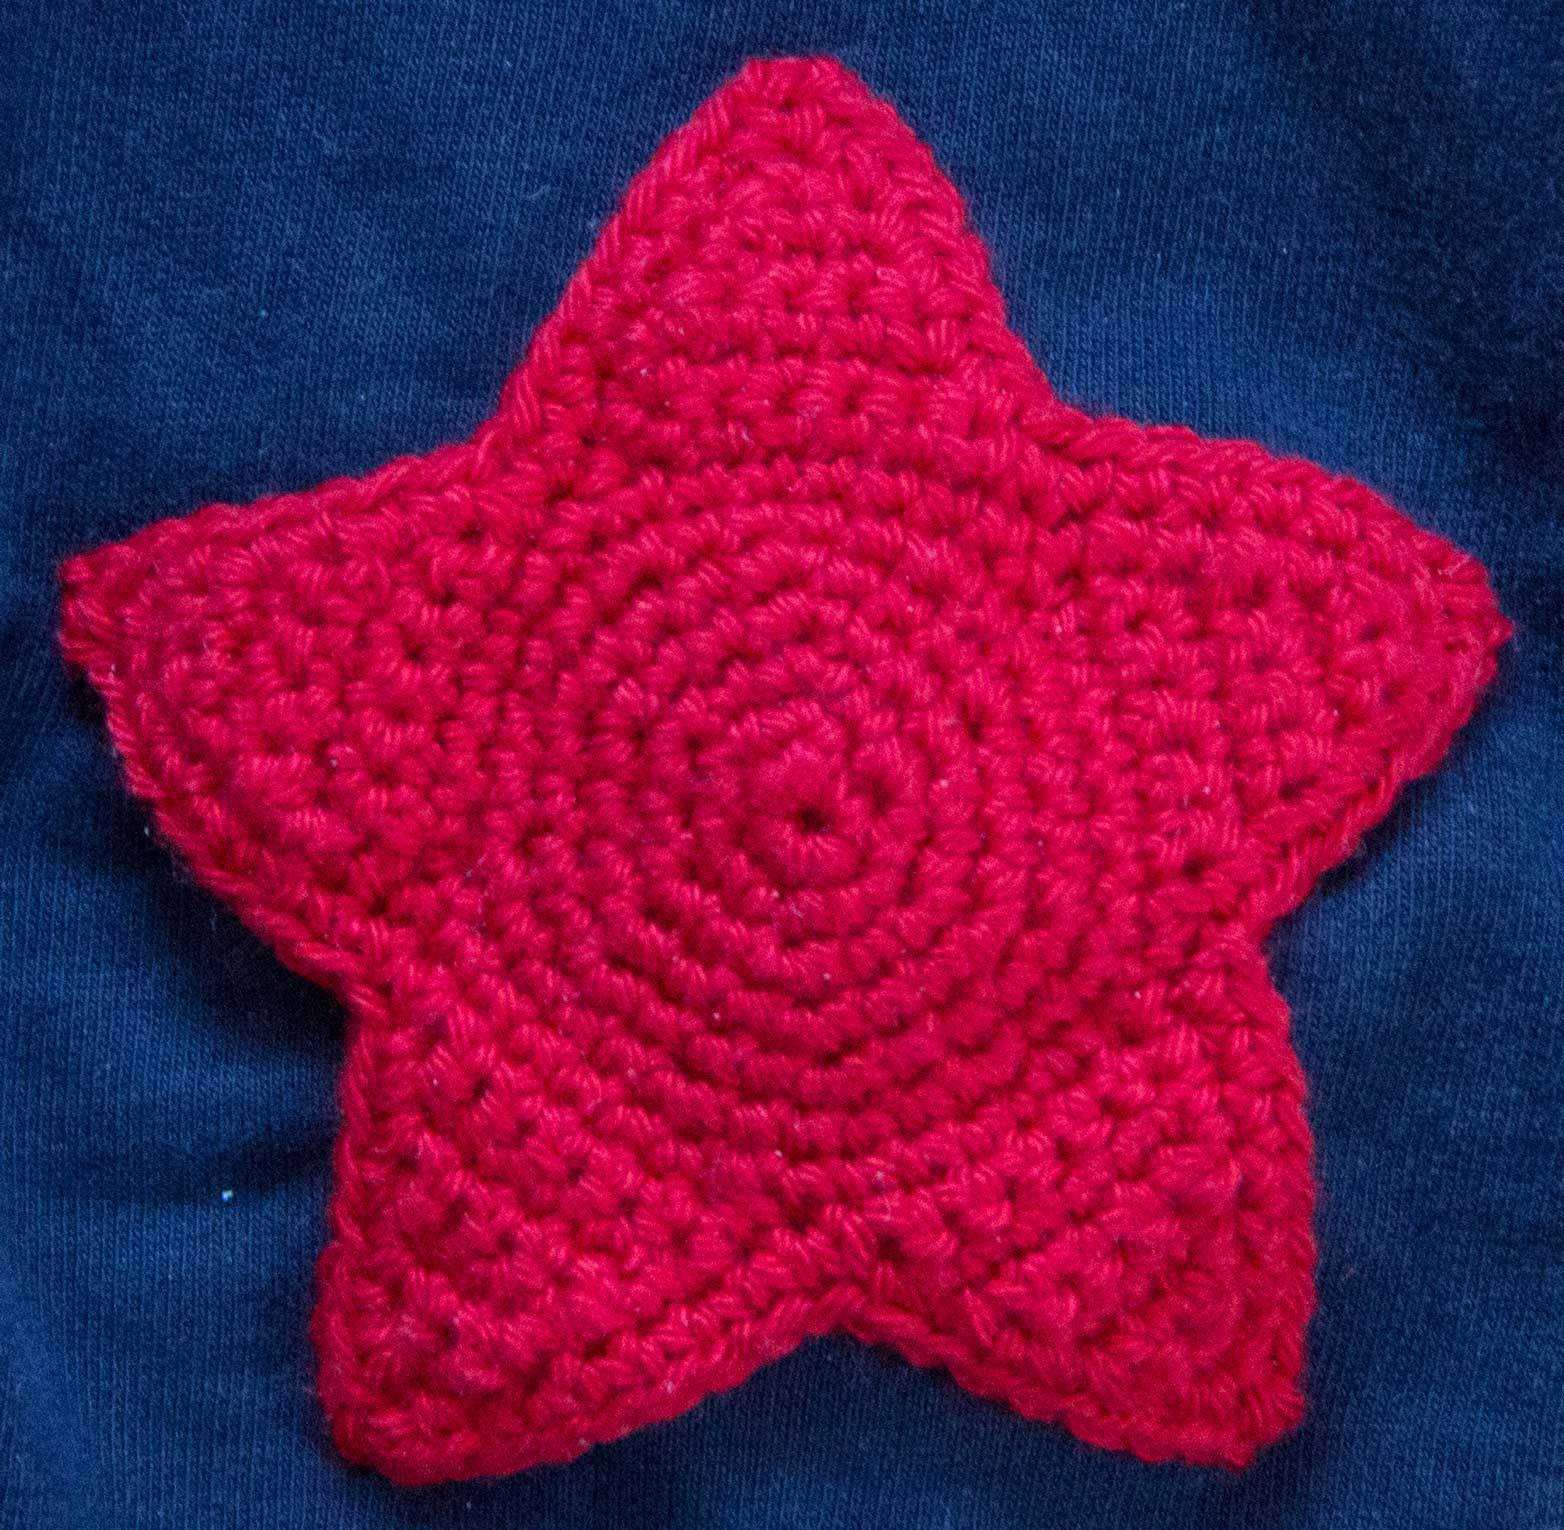 crochet star free patern